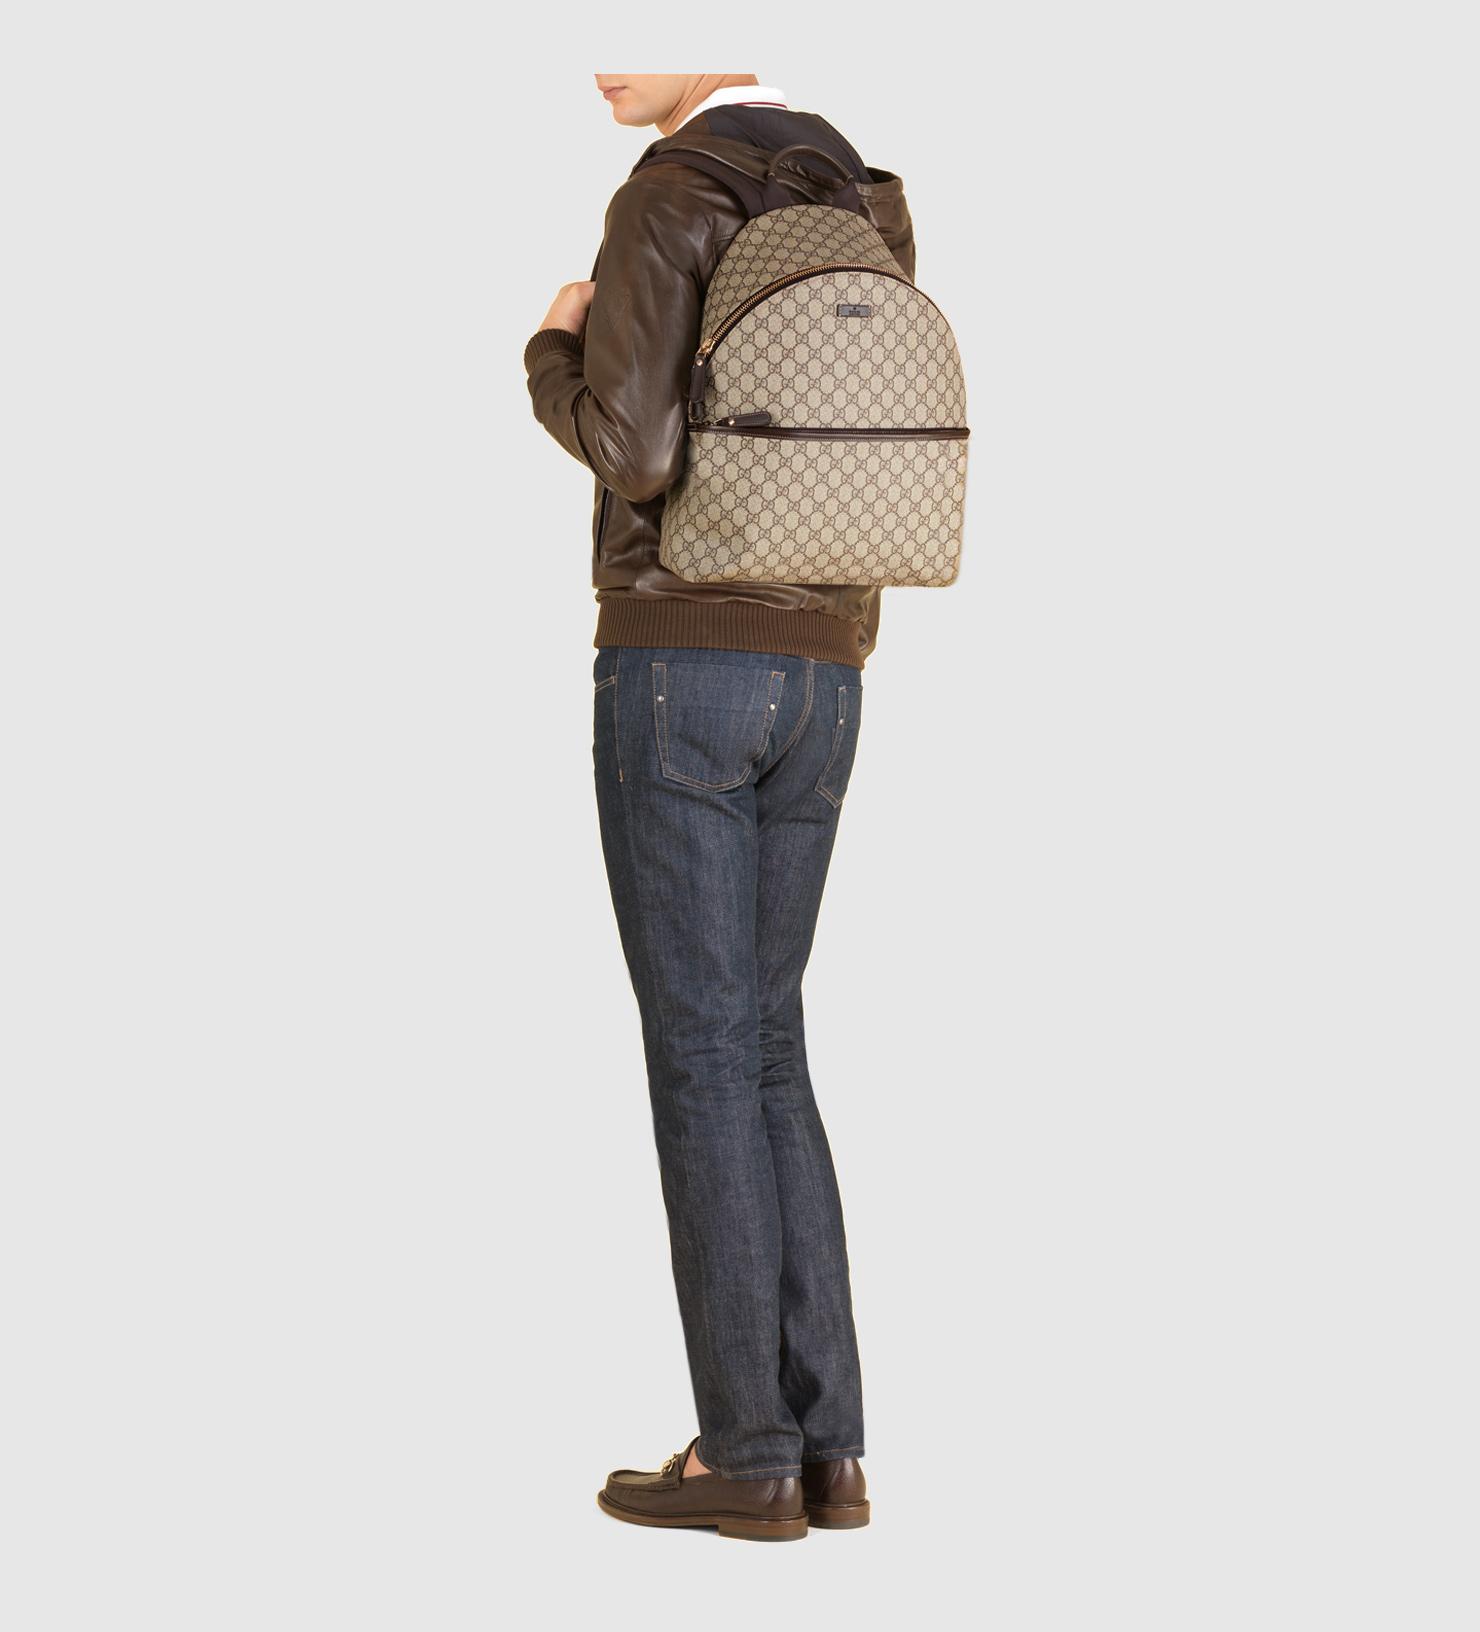 7da5fac0ebb4bb Gucci Gg Supreme Canvas Zip Backpack in Gray for Men - Lyst